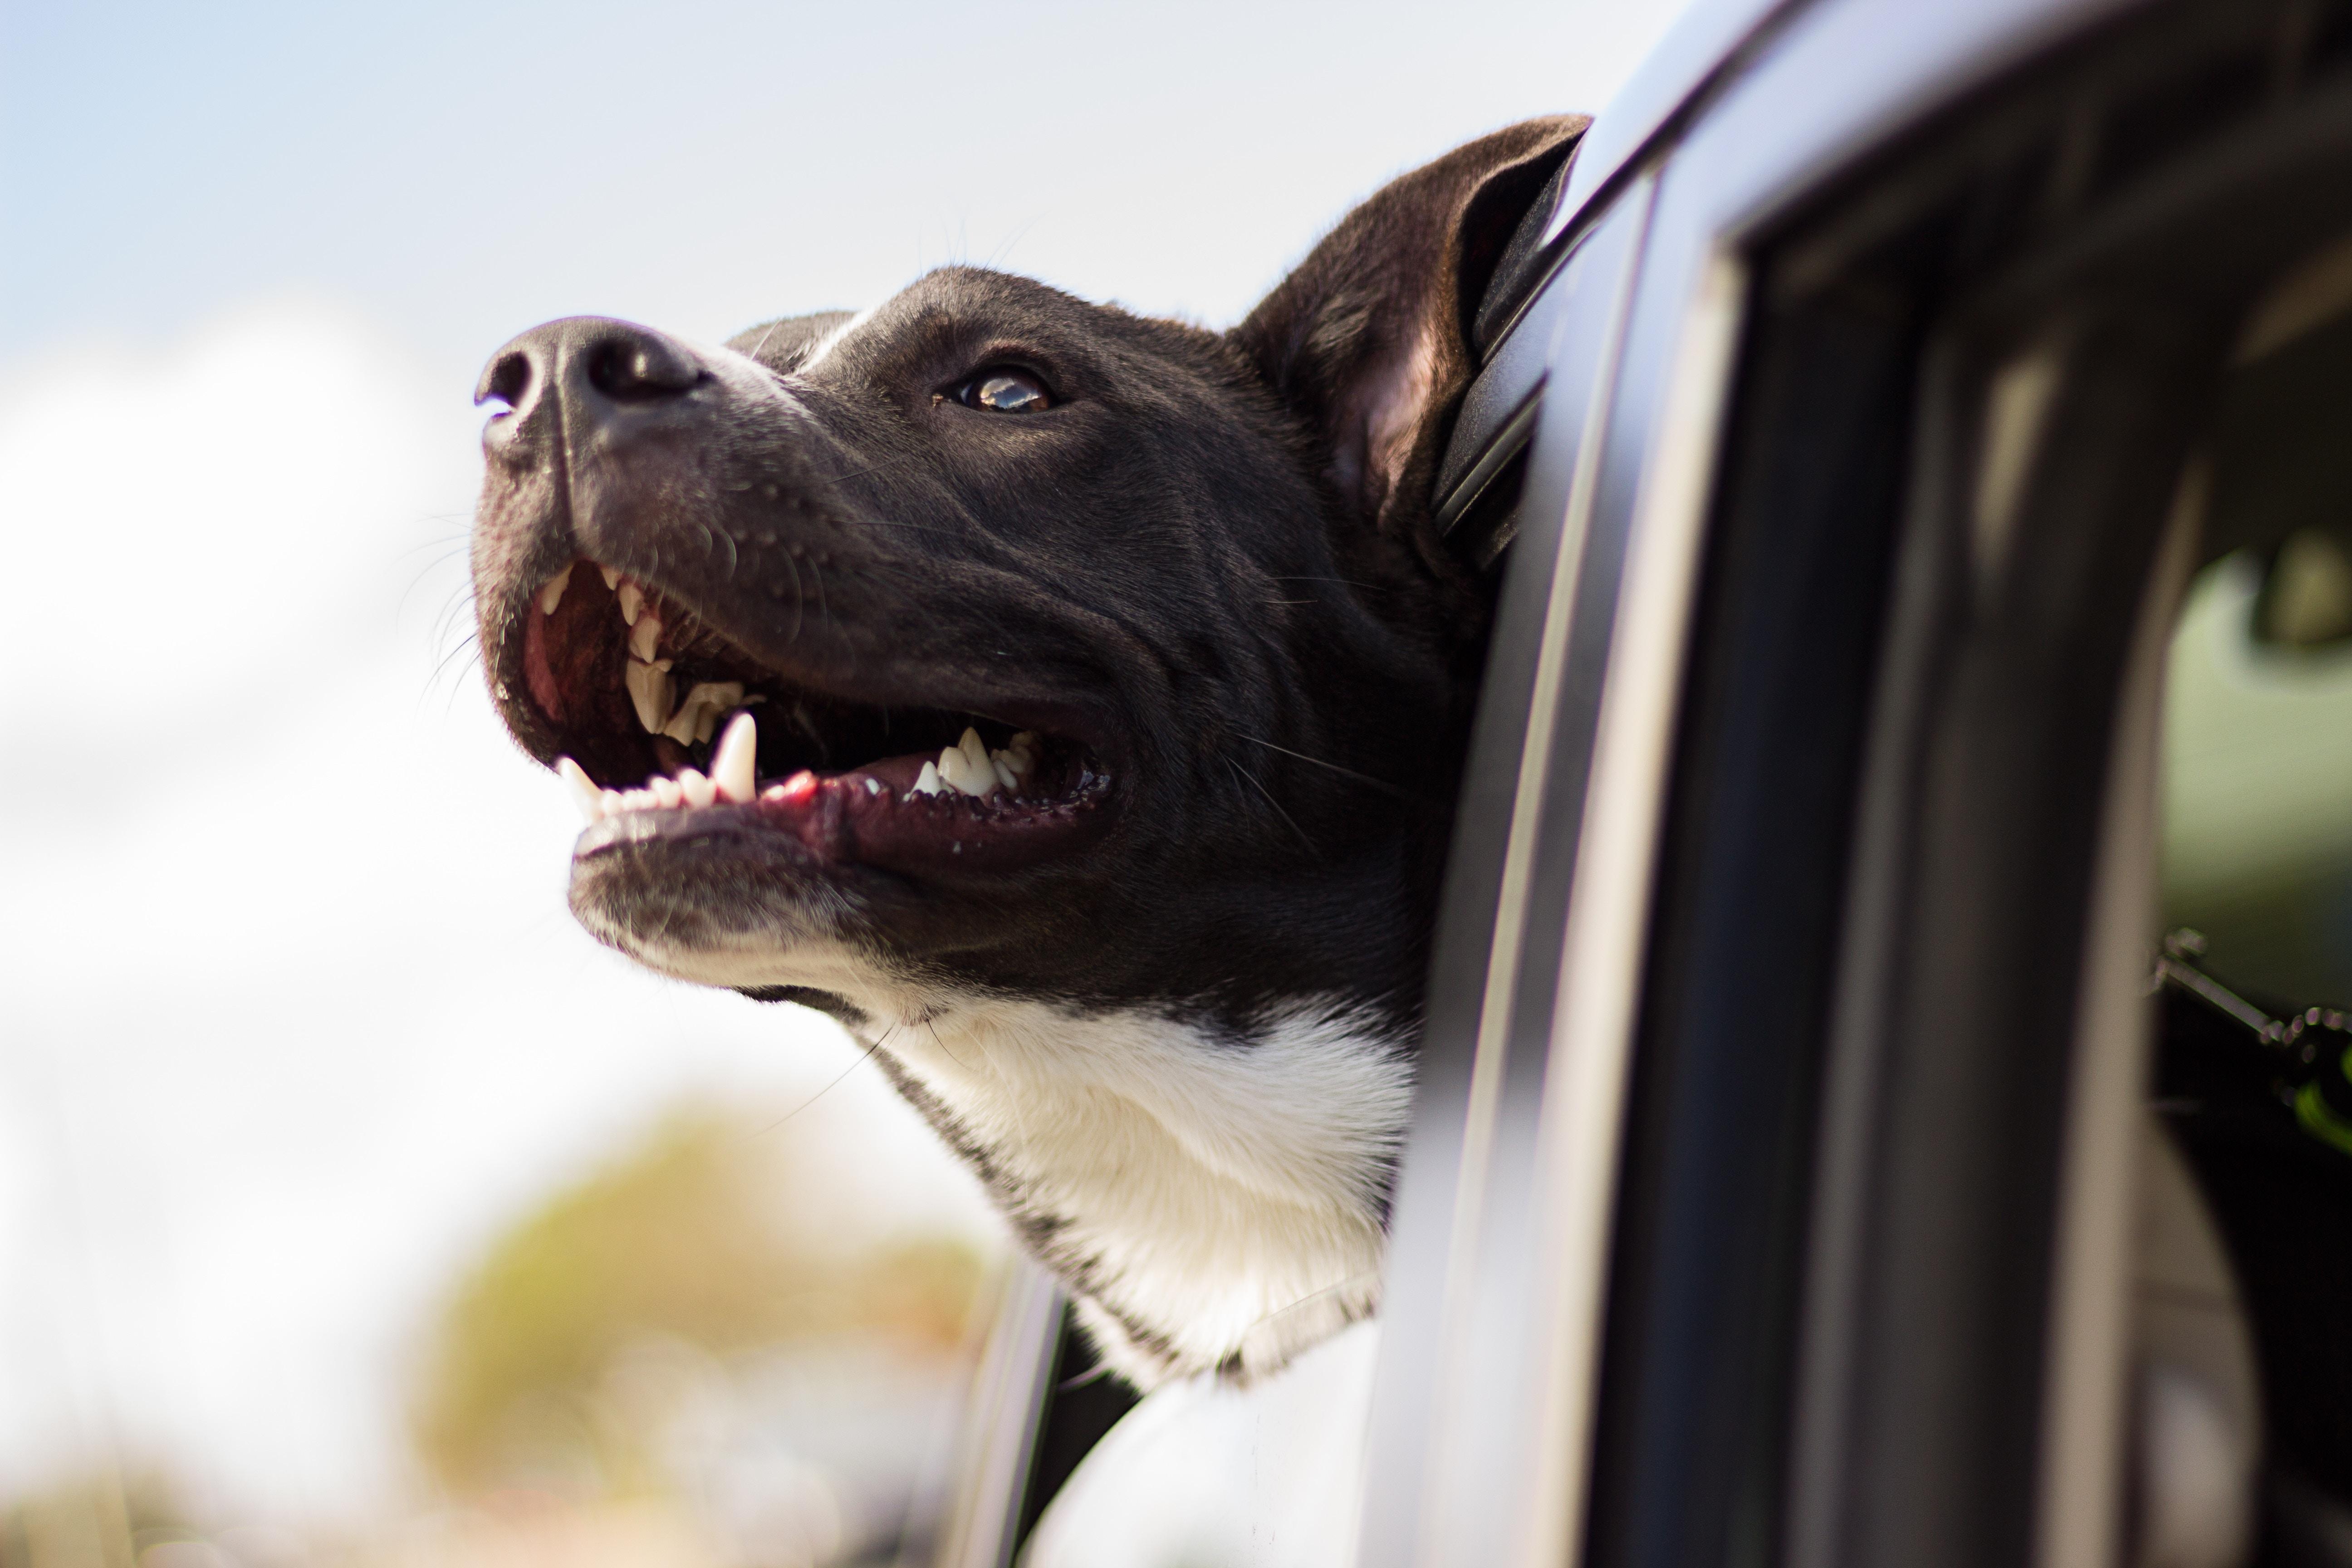 Hitzschlag beim Hund - die wichtigsten Fakten, www.vet-dogs.de, www.vetdogs.de, online Tierarzt